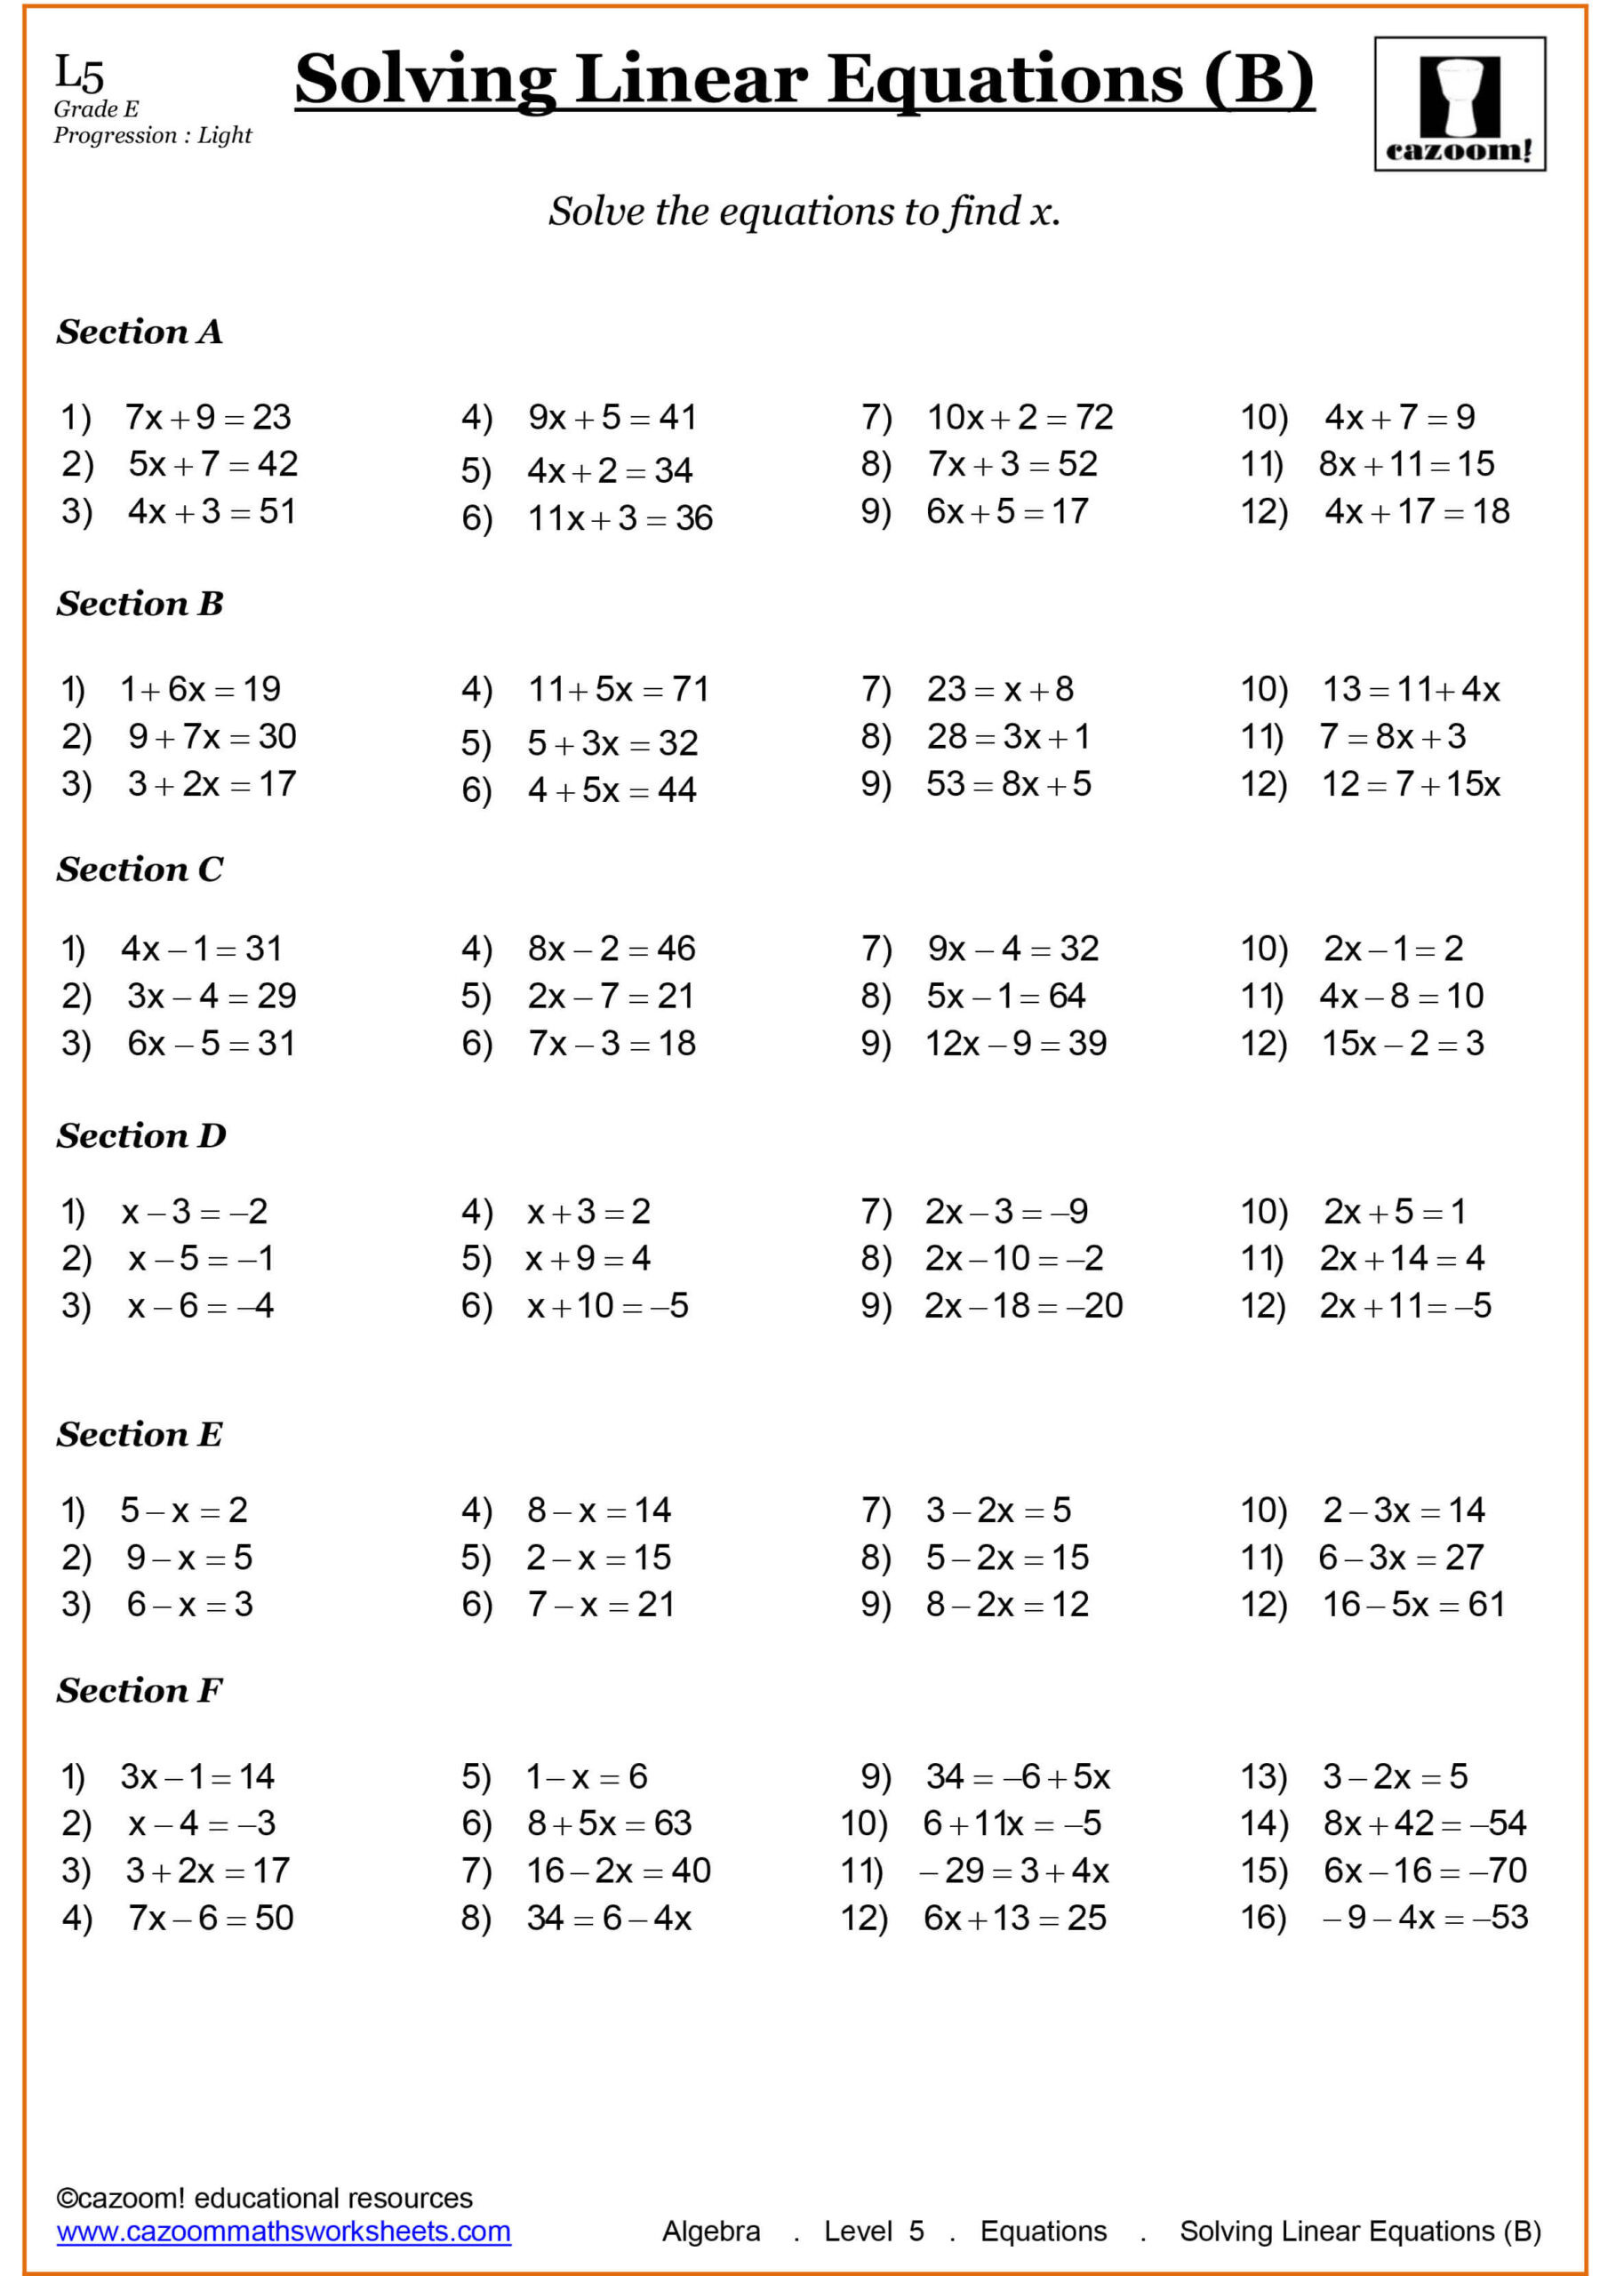 Algebra 1 Functions Worksheet Elementary Mathematics 1 Free Early Math Worksheets Function